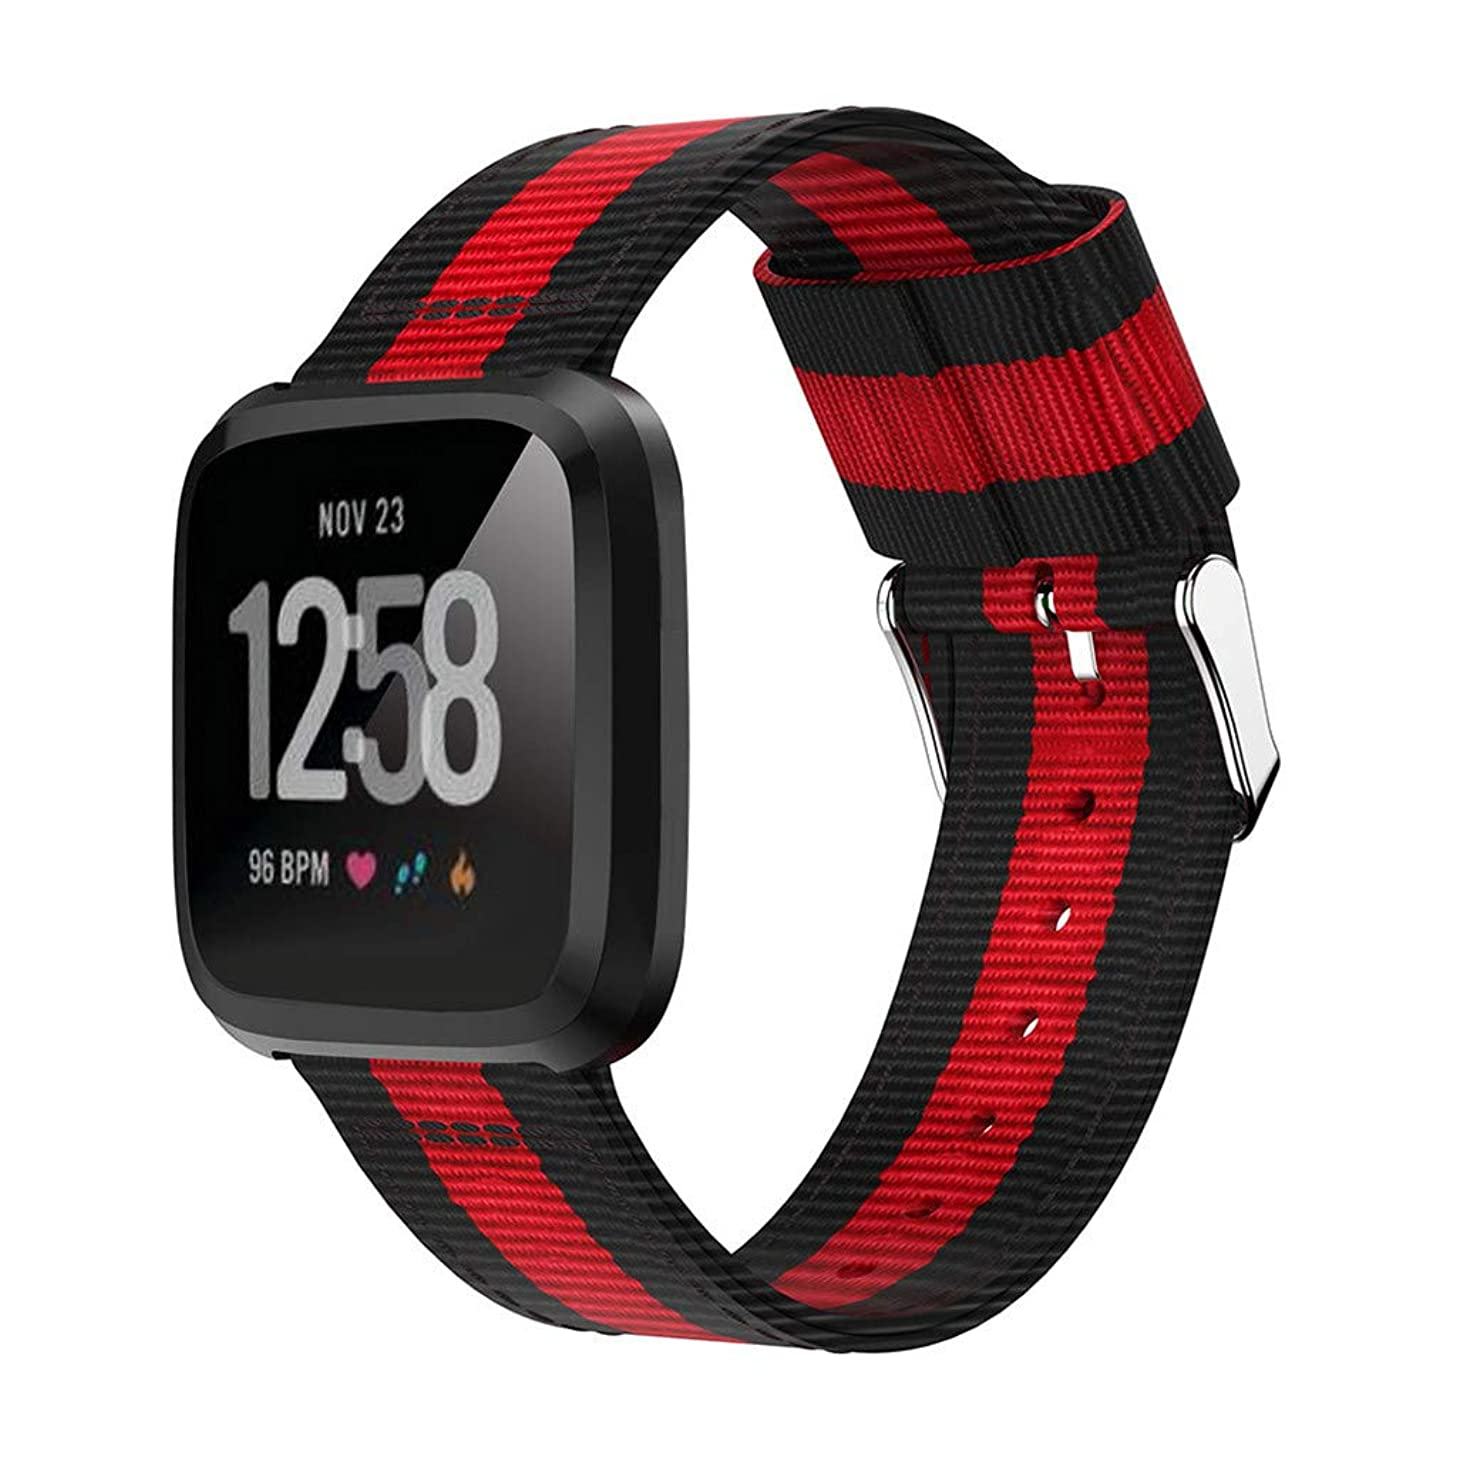 IOTdou Lightweight Nylon Adjustable Replacement Watch Band Sport Strap for Fitbit Versa Lite Simple Unisex Watch Band Sport Strap